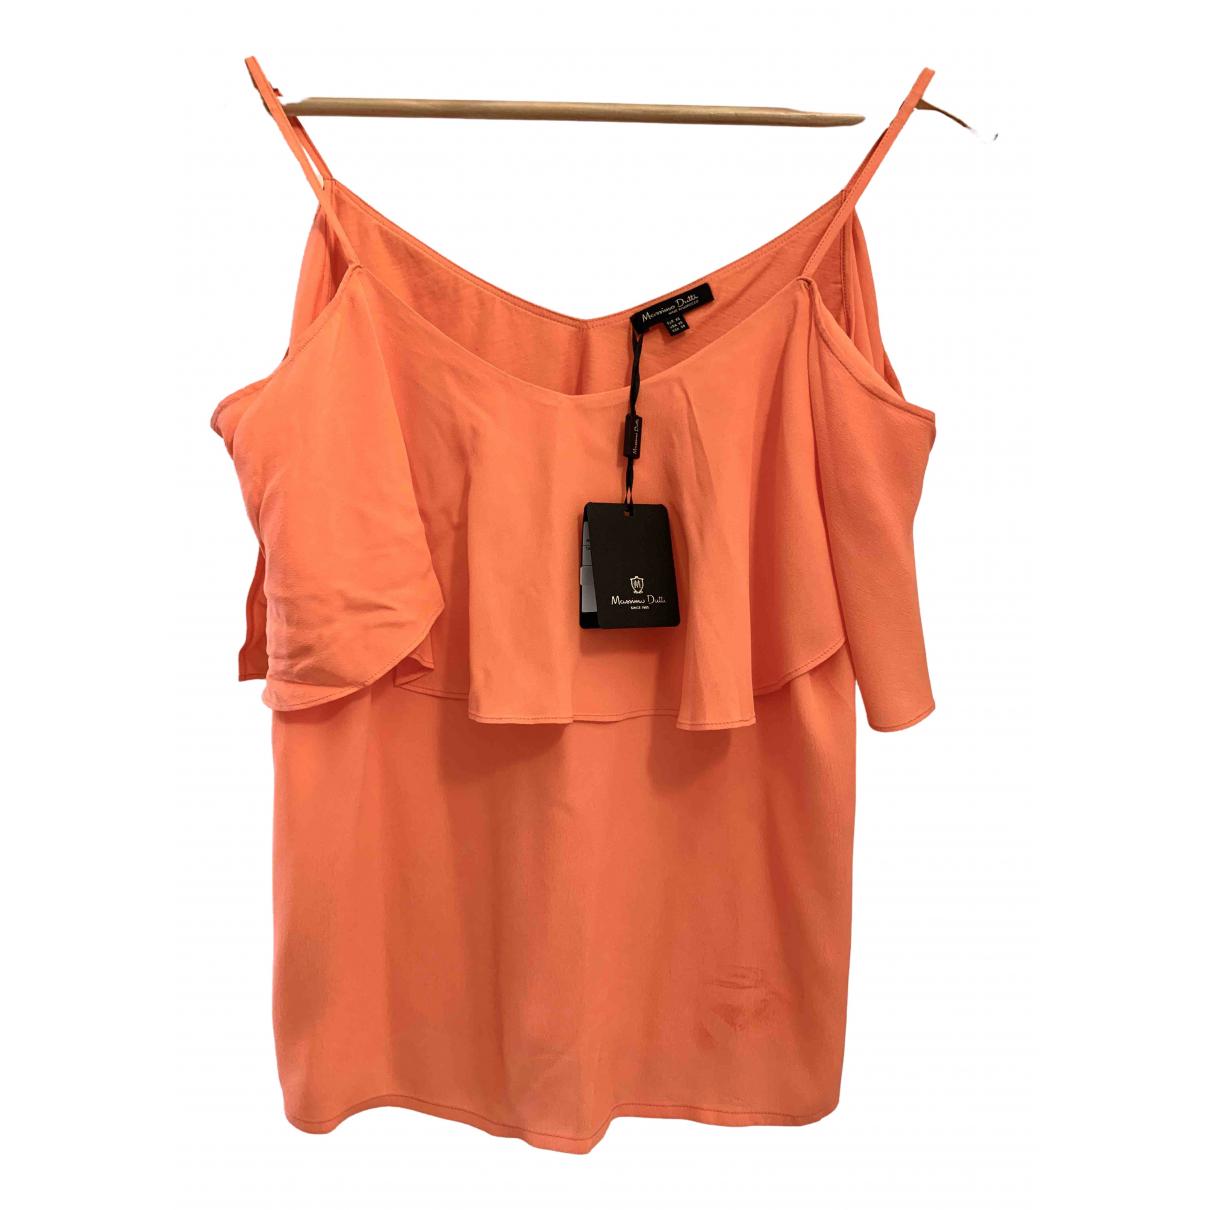 Massimo Dutti - Top   pour femme - orange